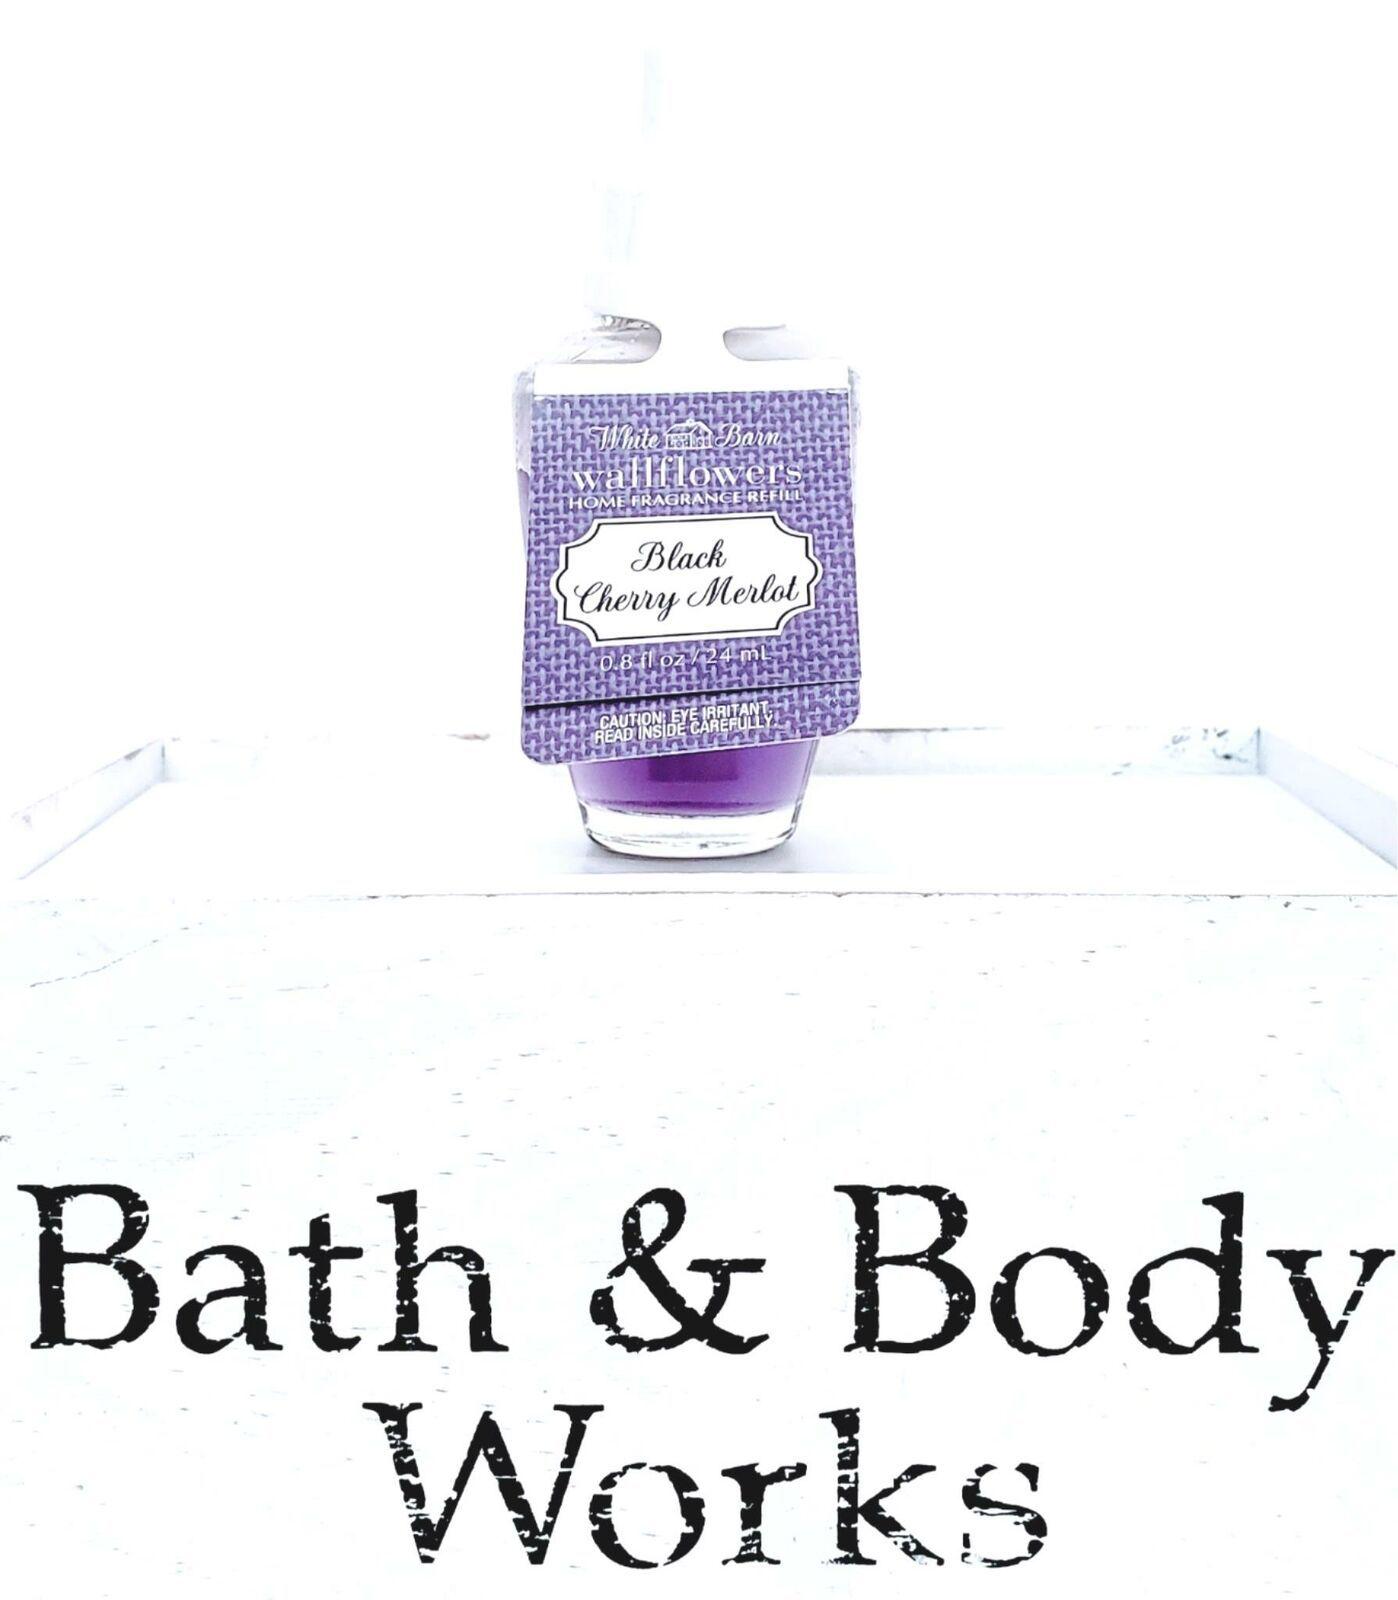 Bath & Body Works Black Cherry Merlot Hand Soap, Pocketbac & Wallflower Refill